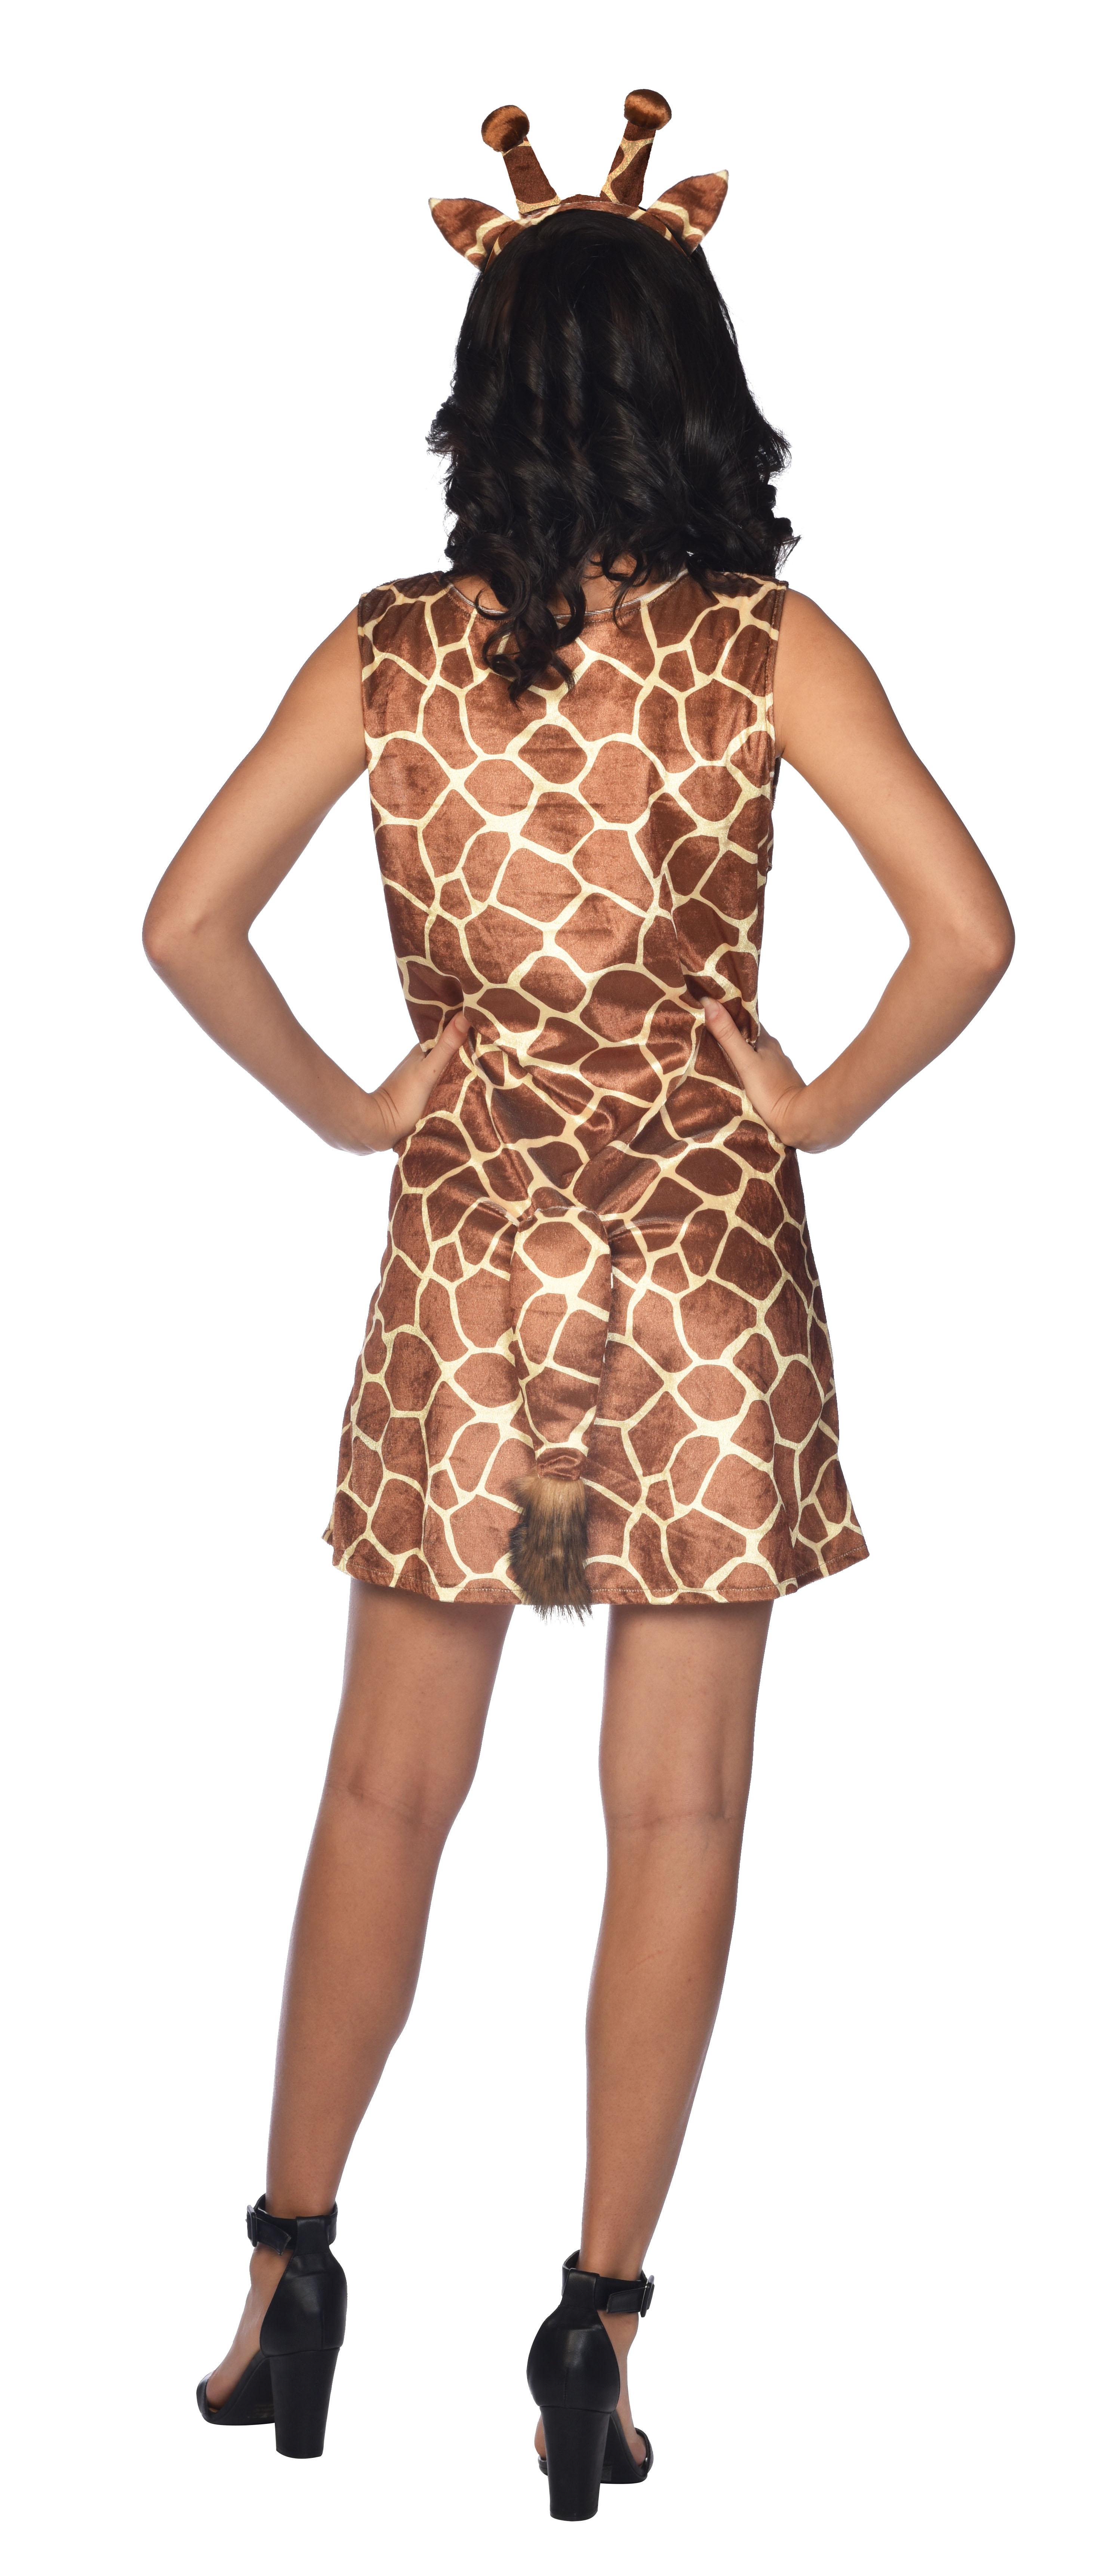 Indexbild 15 - Adult Ladies Zoo Safari Animal Giraffe Lady Fancy Dress Costume Womens Outfit